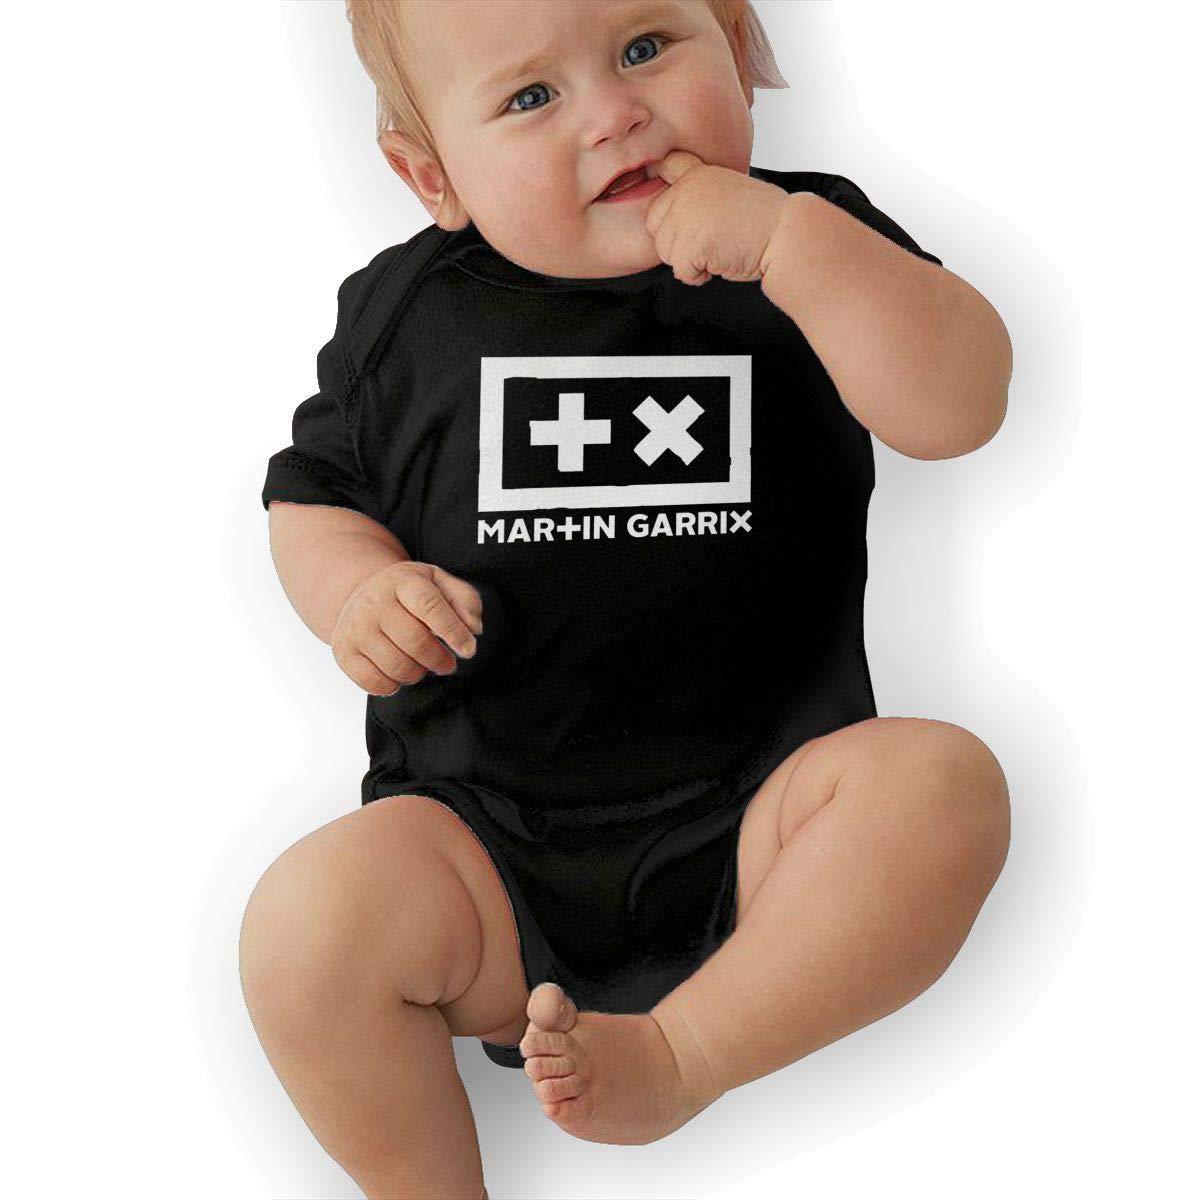 Kids Martin Garrix Cute Soft Music Band Jersey Bodysuit,Black,6M